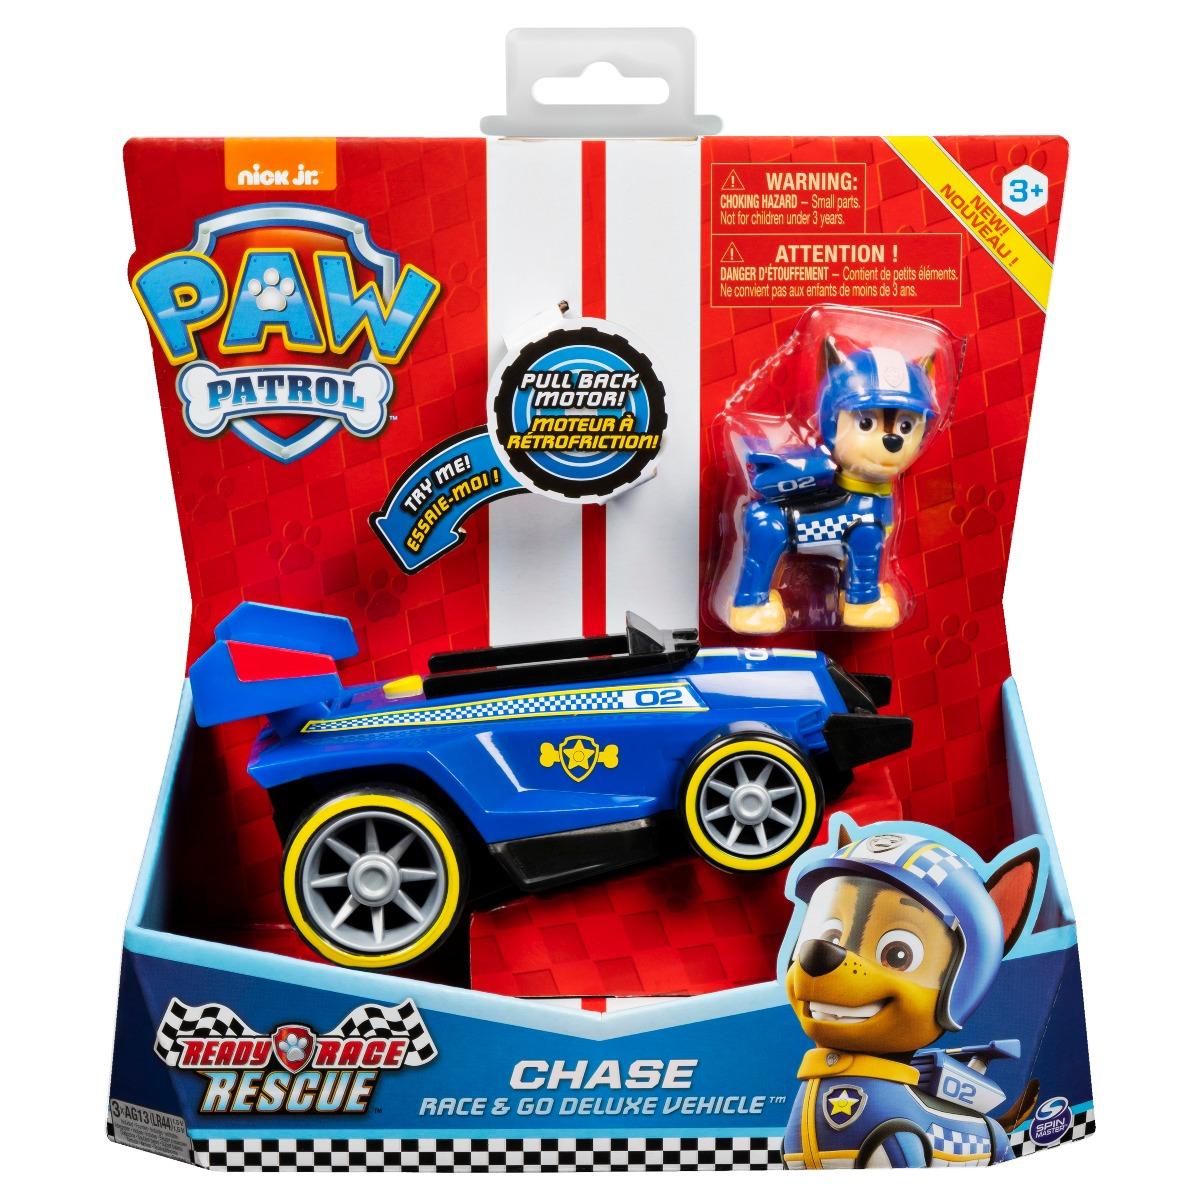 Masinuta cu figurina Paw Patrol Ready Race, Chase 20119526